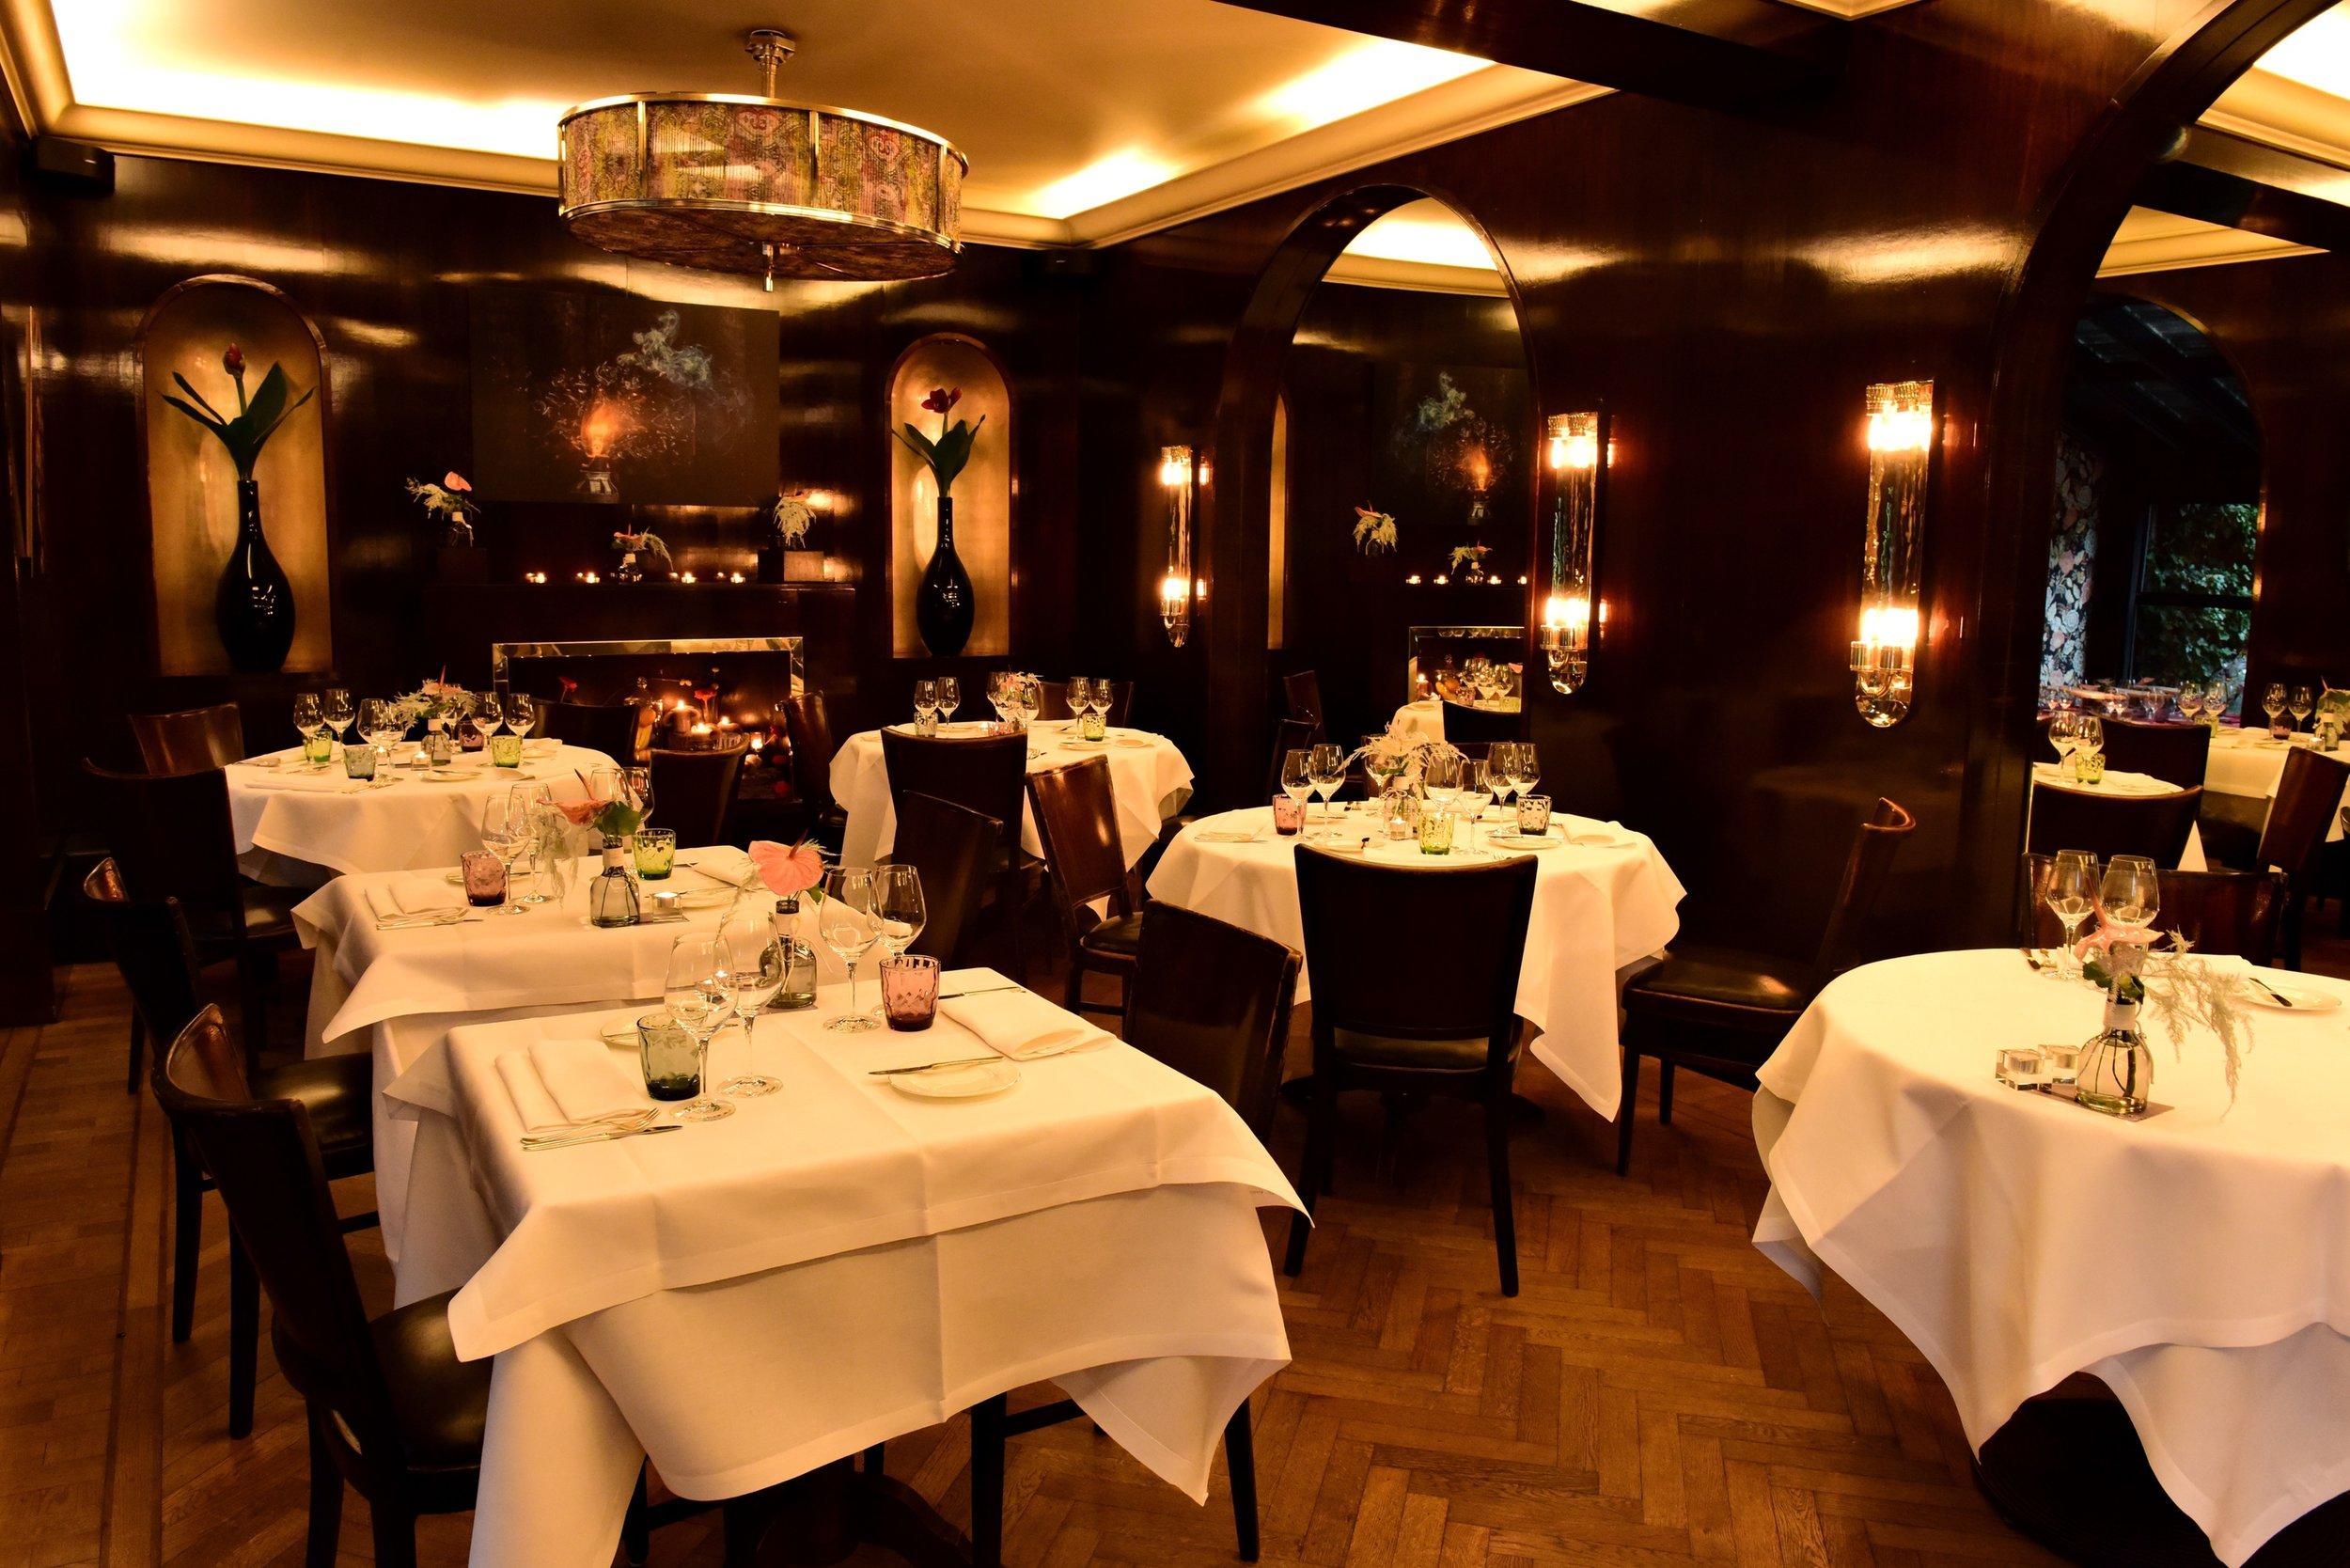 11 restaurant de mangerie lauwe tablefever bart albrecht .jpg